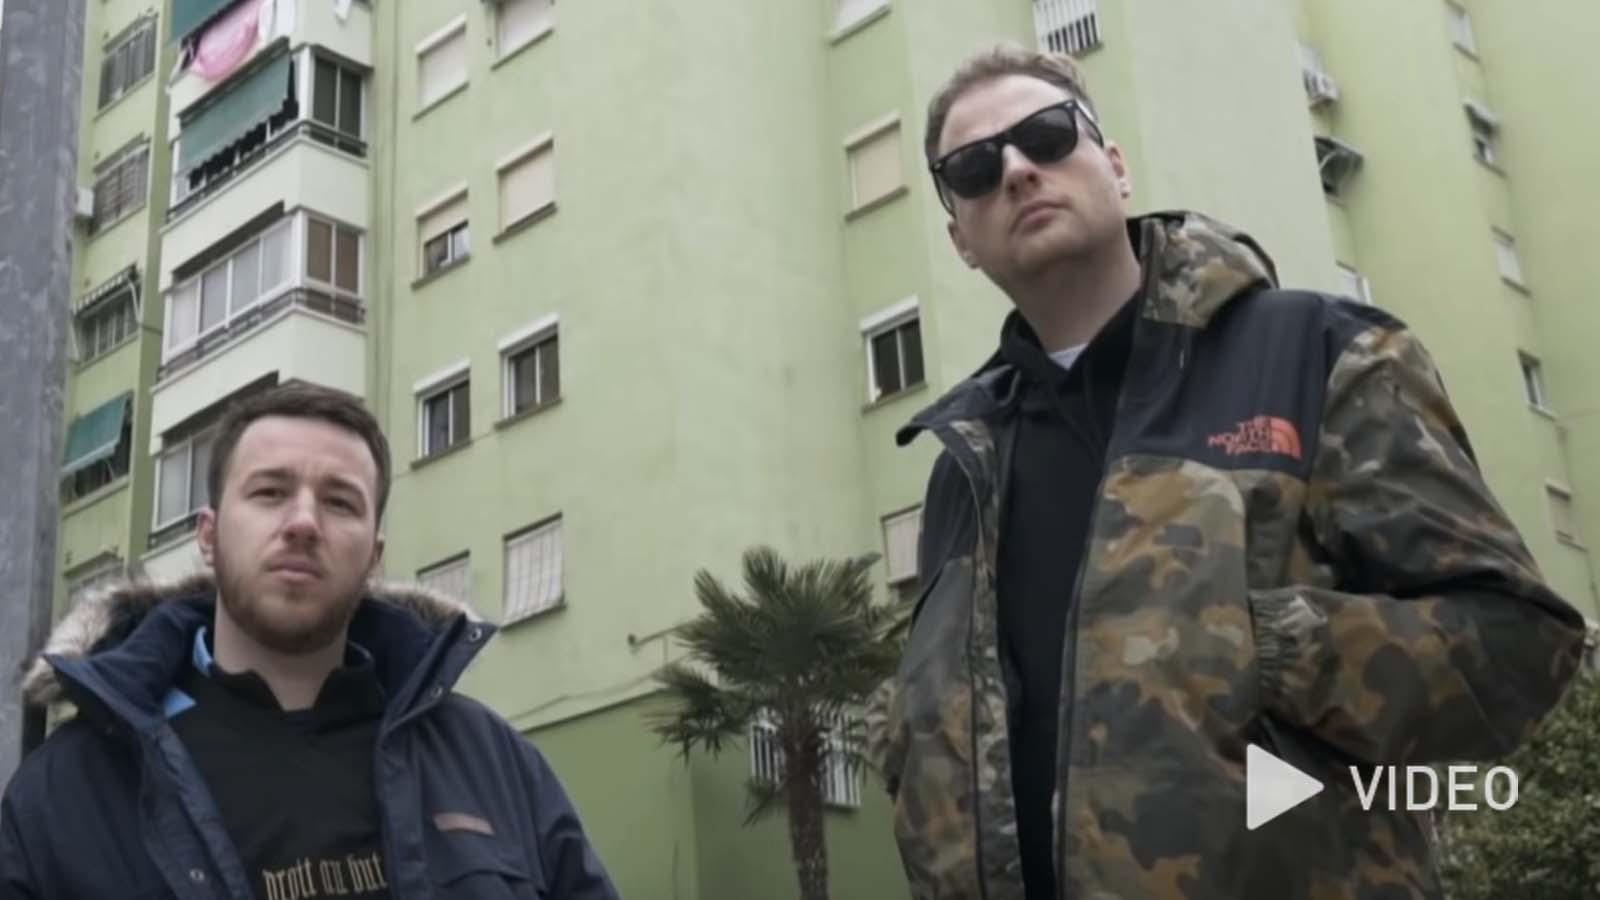 Weekend ft. Pimf – Geh Weg [Video]